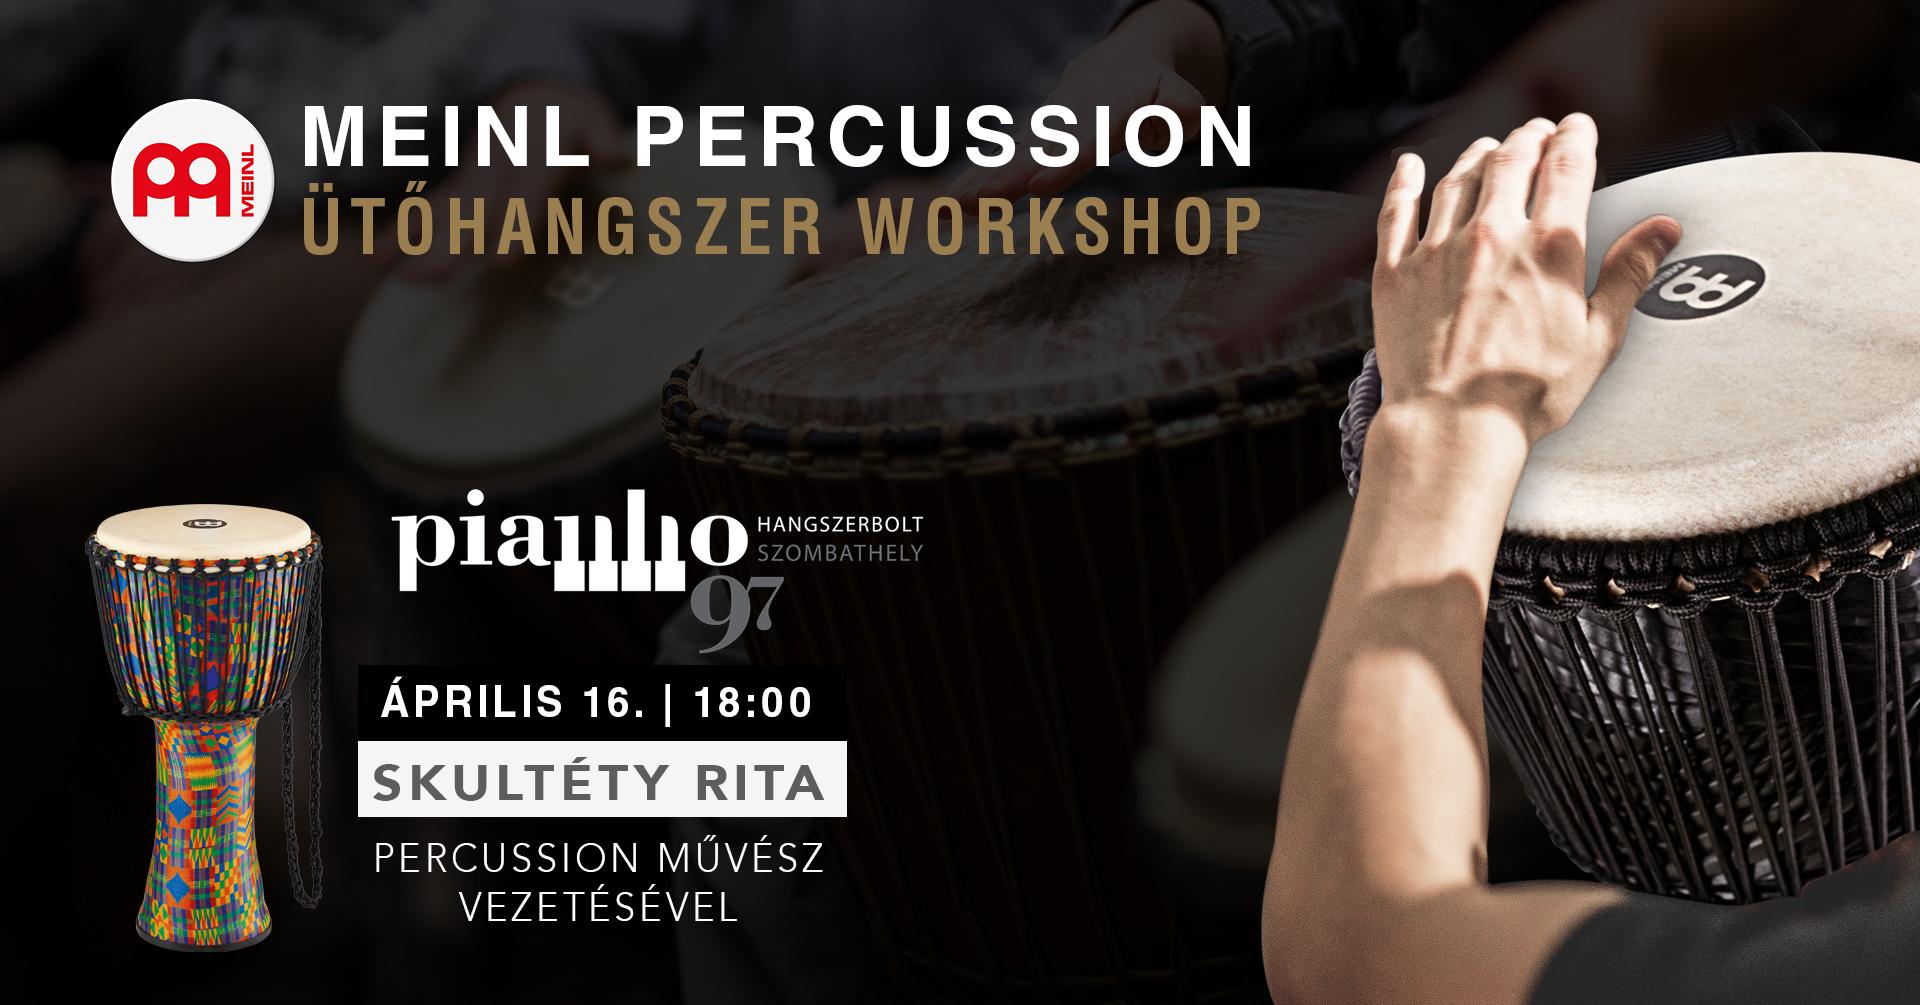 meinl_percussion_bemutato_es_utohangszer_workshop_a_pianho_hangszerboltban_1.jpg